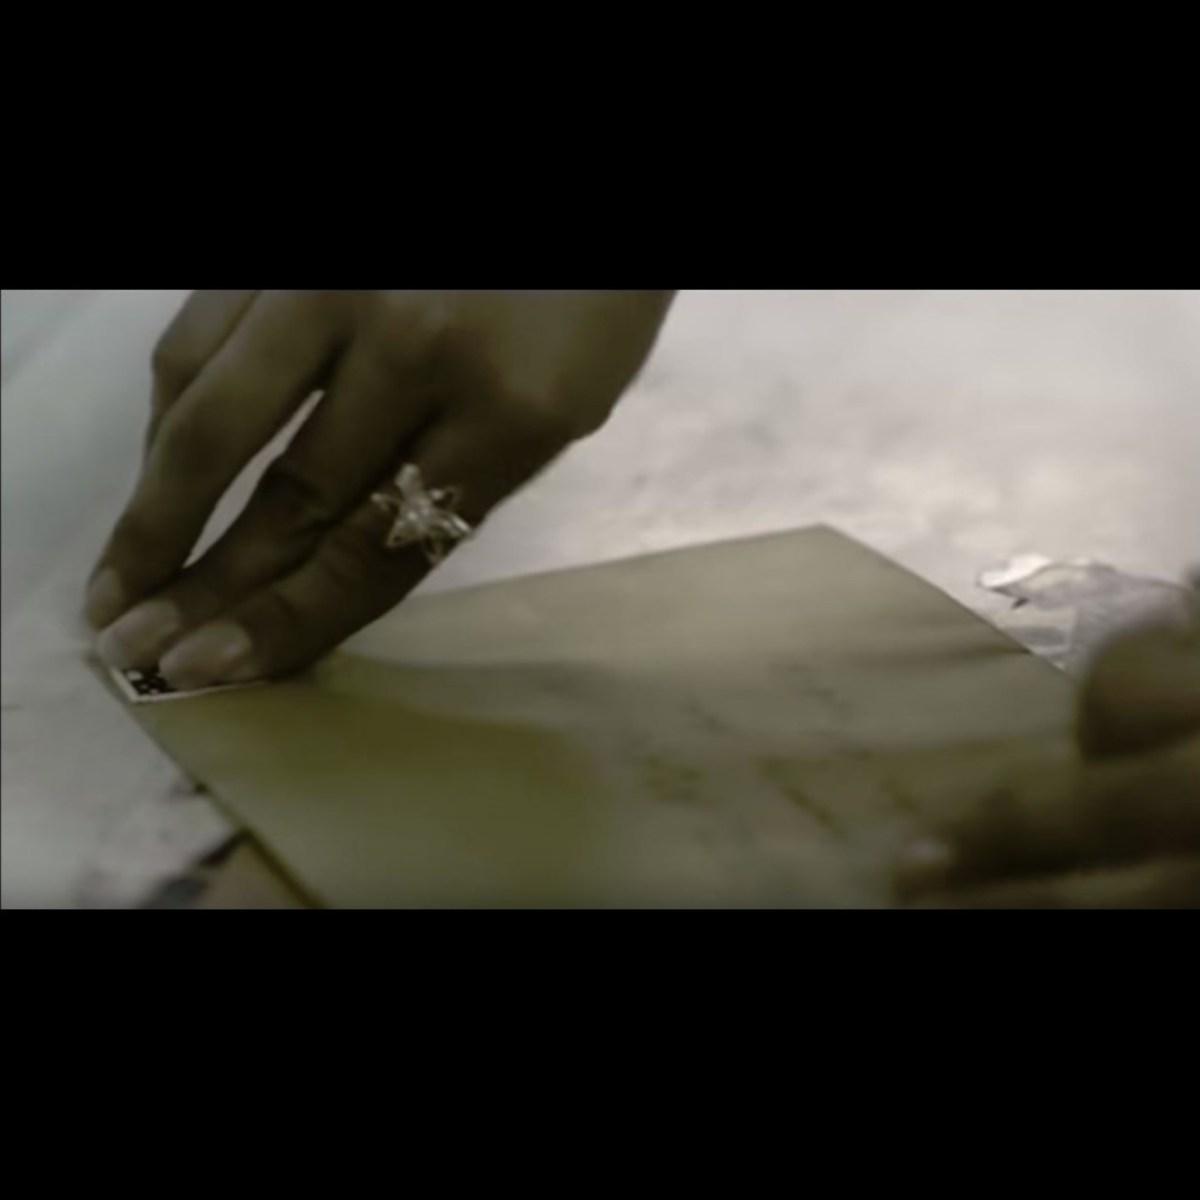 2Pac - Thugz Mansion (Acoustic Version) (ft. Nas and J. Phoenix) (Thumbnail)